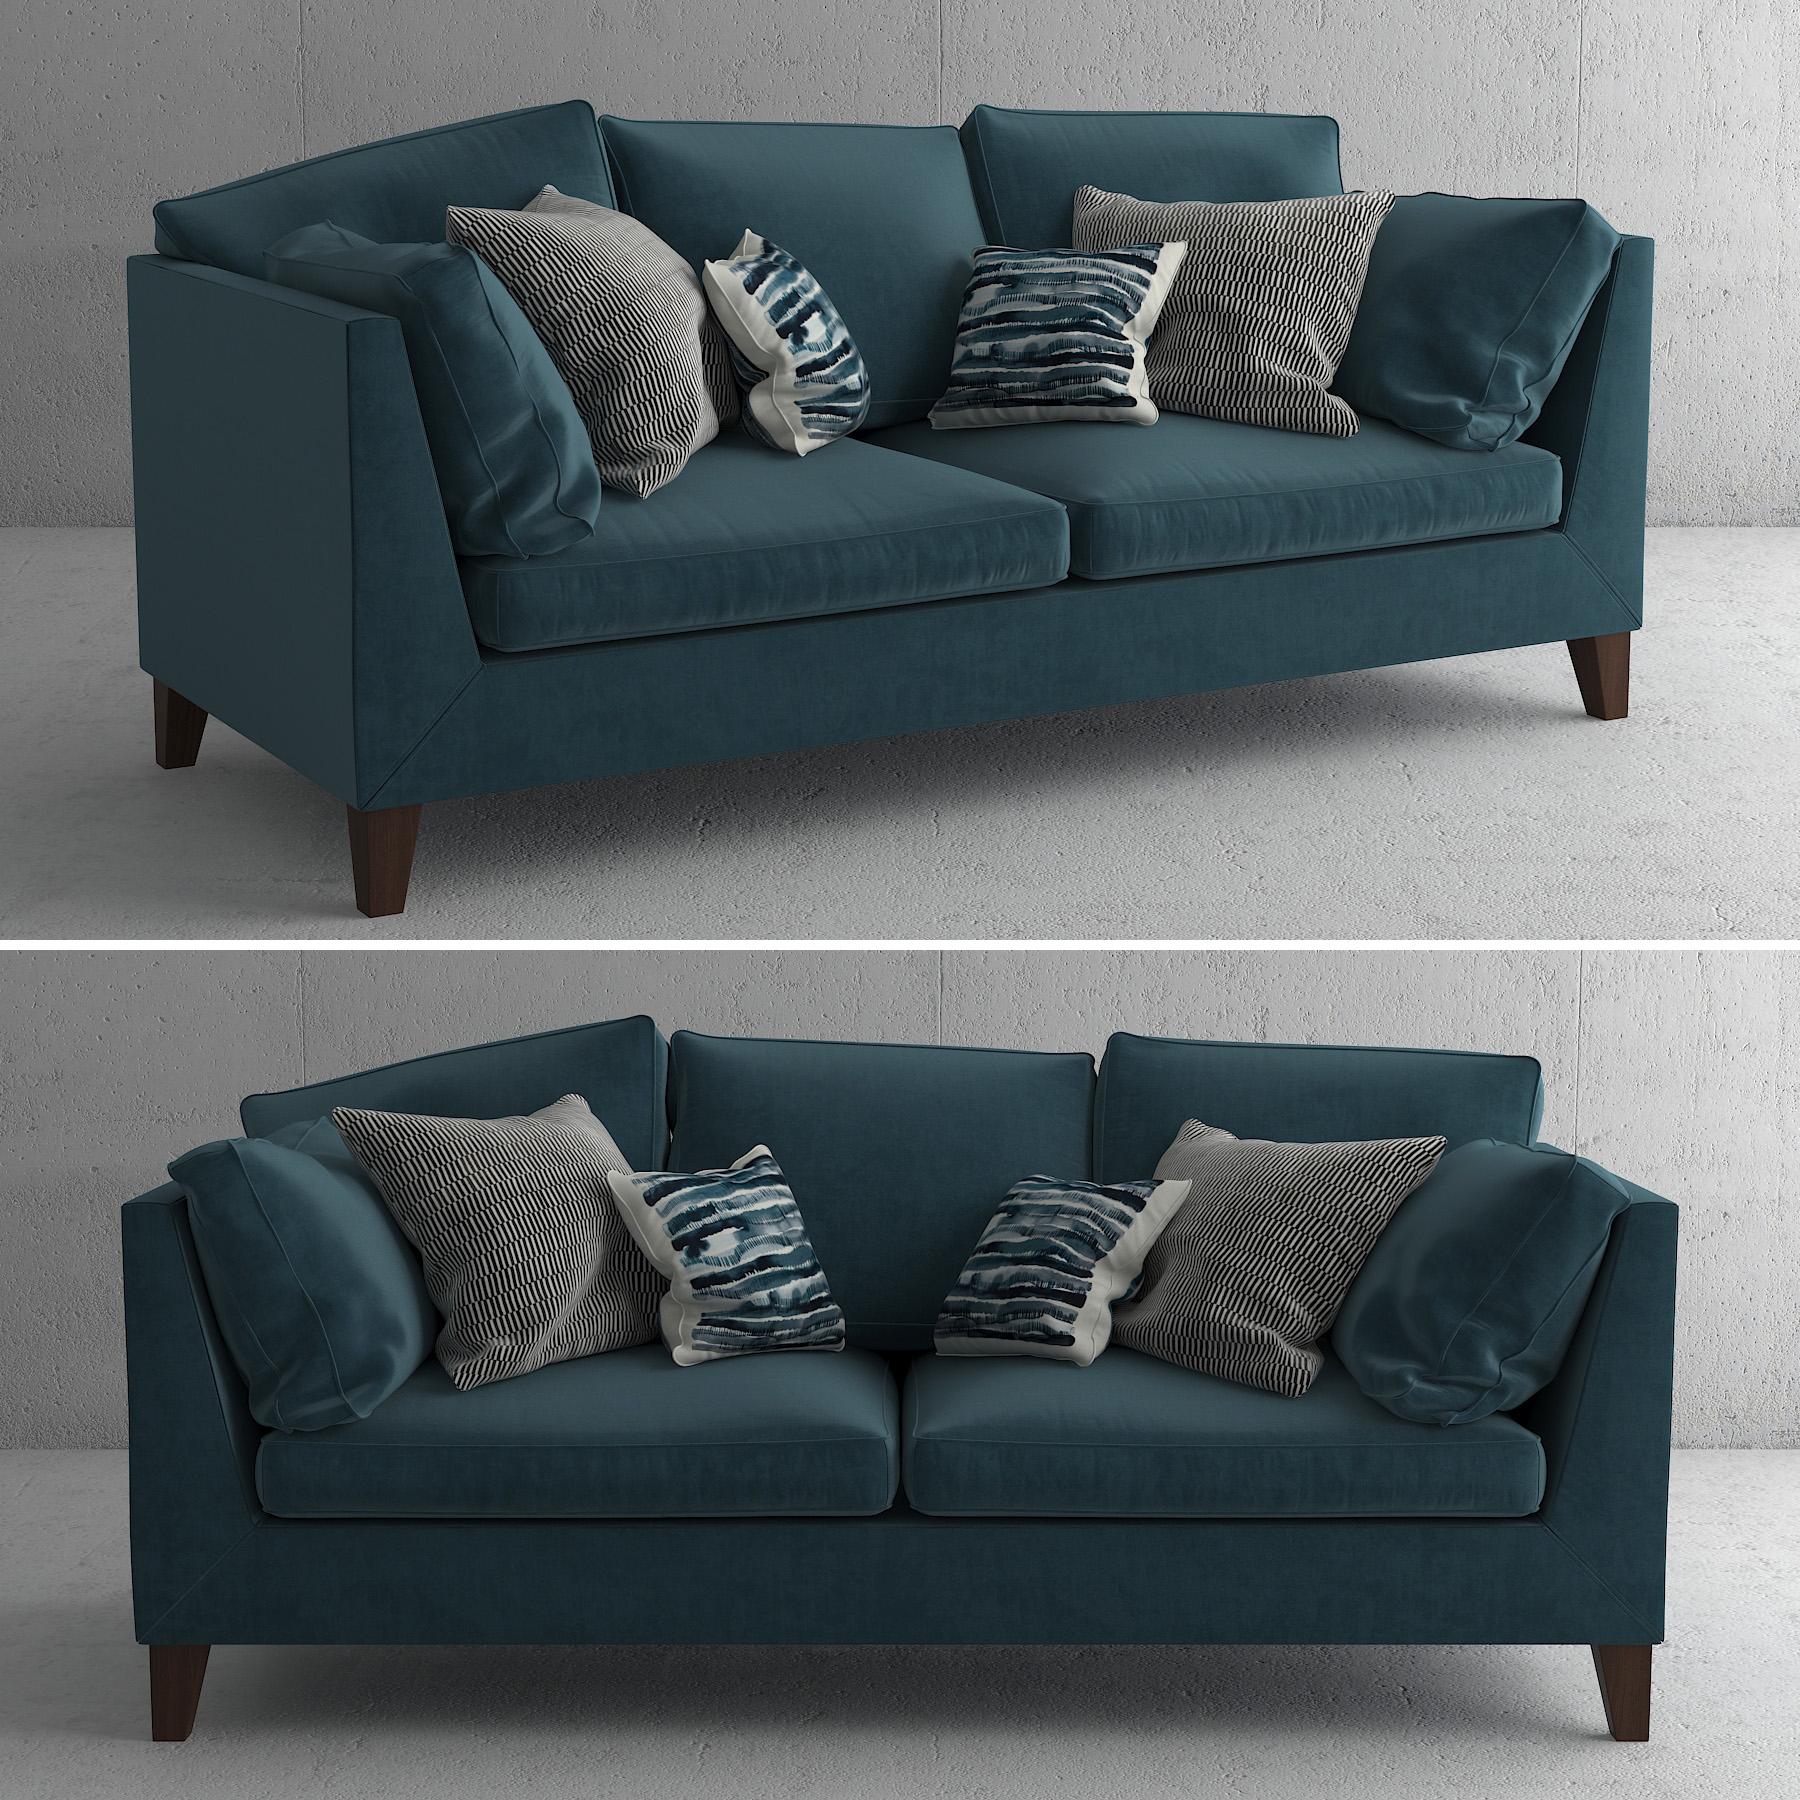 Sofa Cushions Stockholm Model